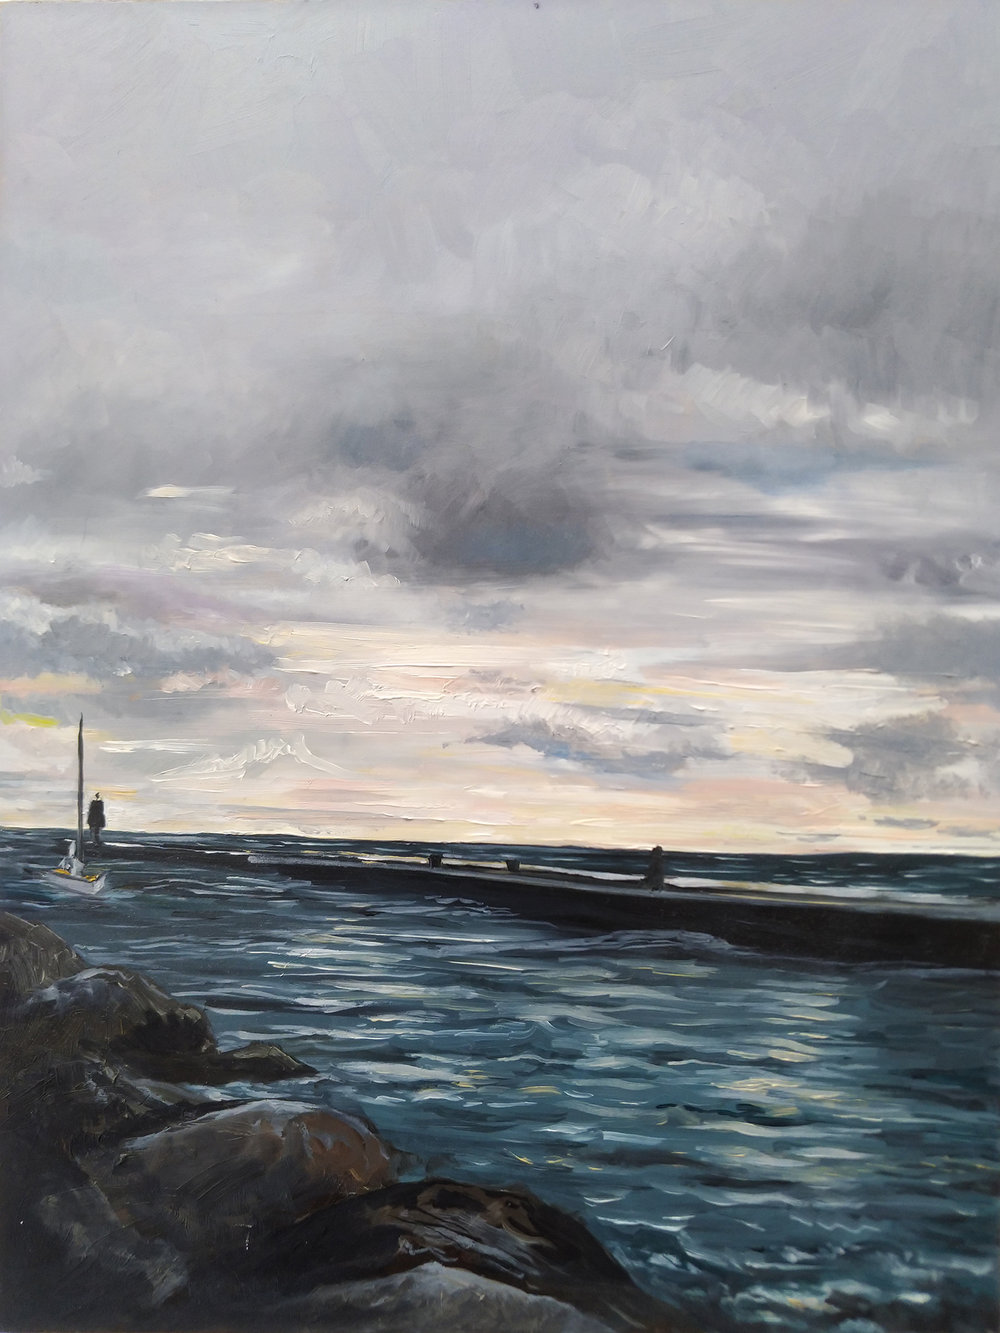 Kincardine Harbour Oil Painting by Amanda Farquharson.jpg